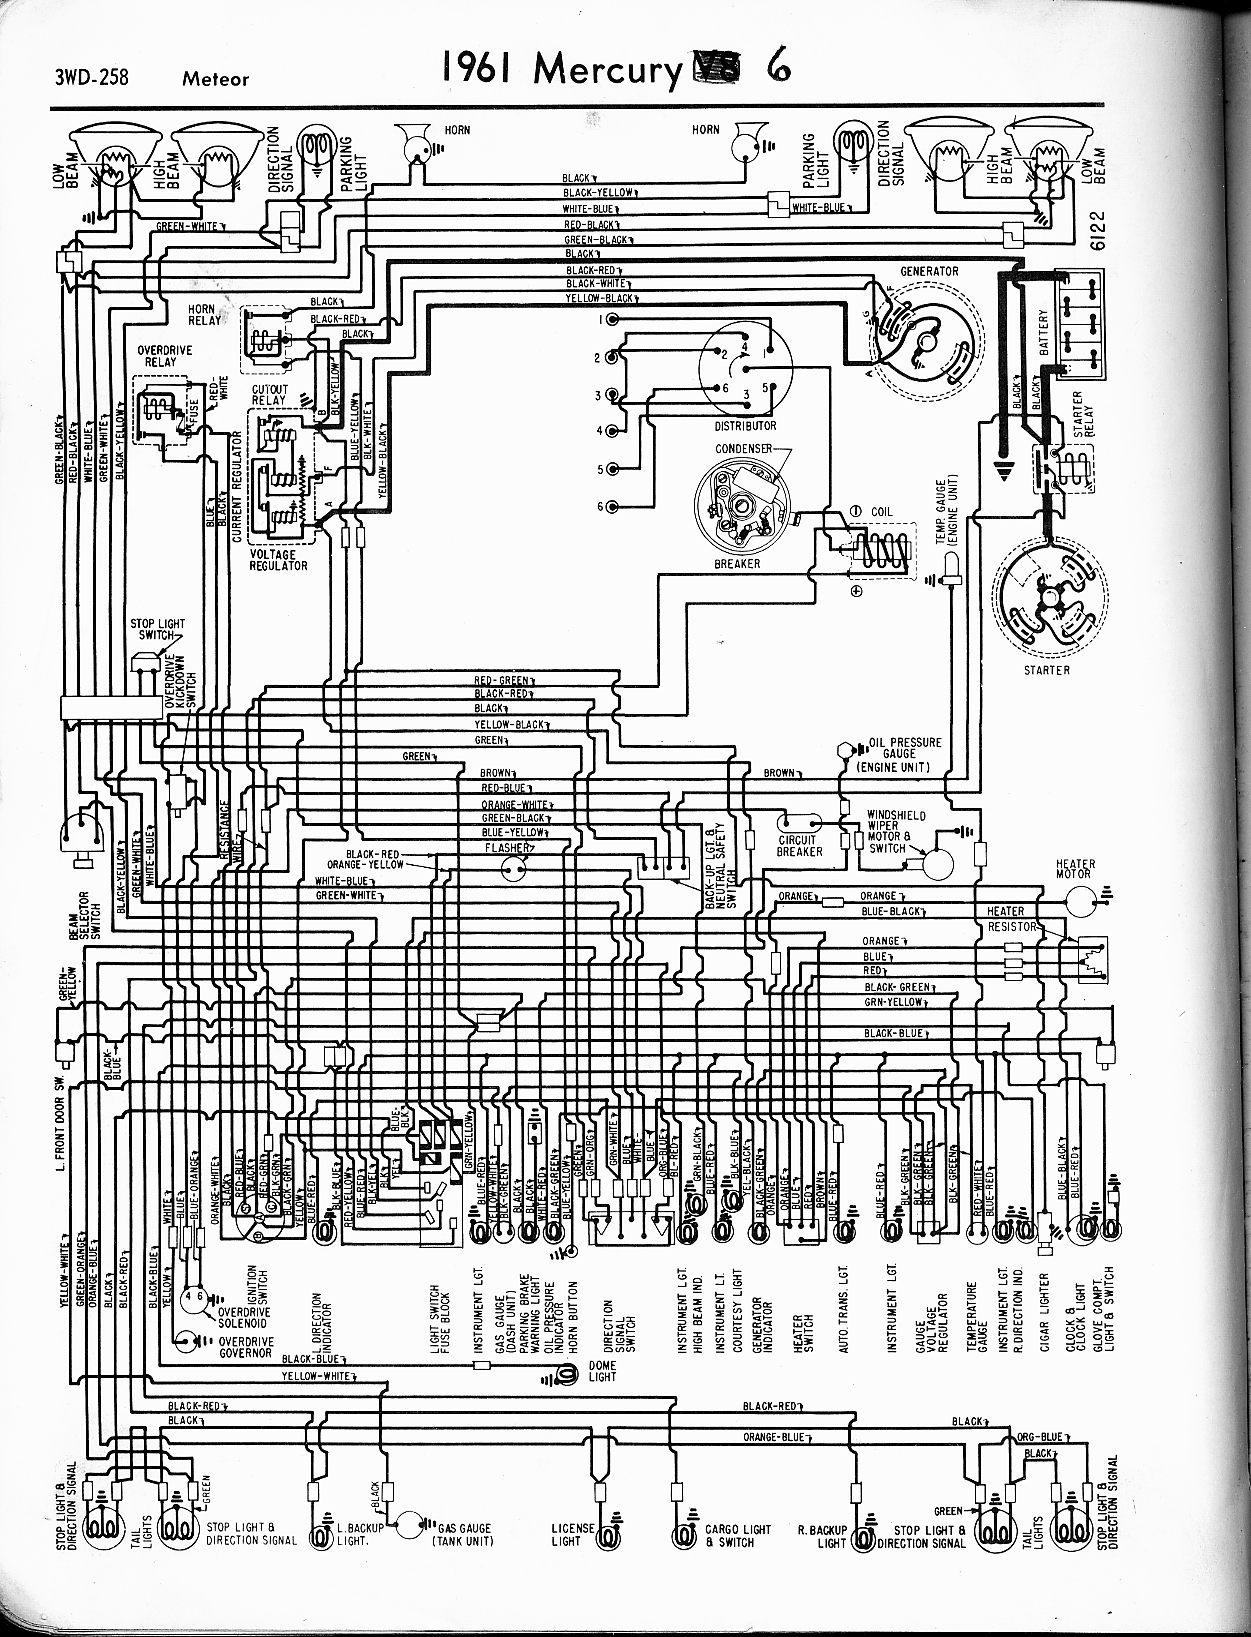 Marvelous Mercury 6 Monterey Wiring 1962 Mercury 6 Monterey Wiring Diagram Wiring Cloud Xortanetembamohammedshrineorg